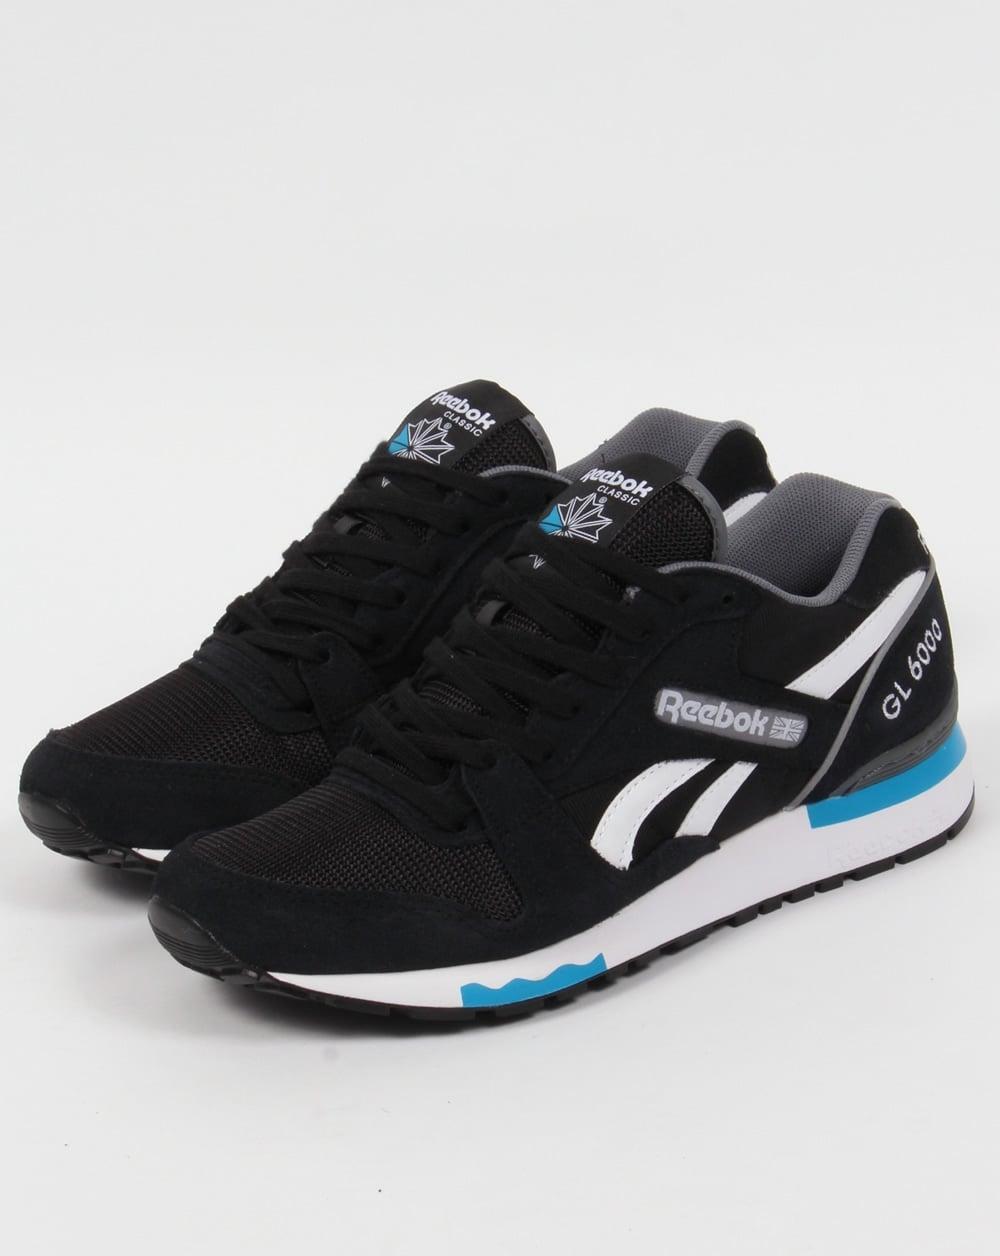 Reebok GL 6000 PP Trainers Black/Alloy/Blue